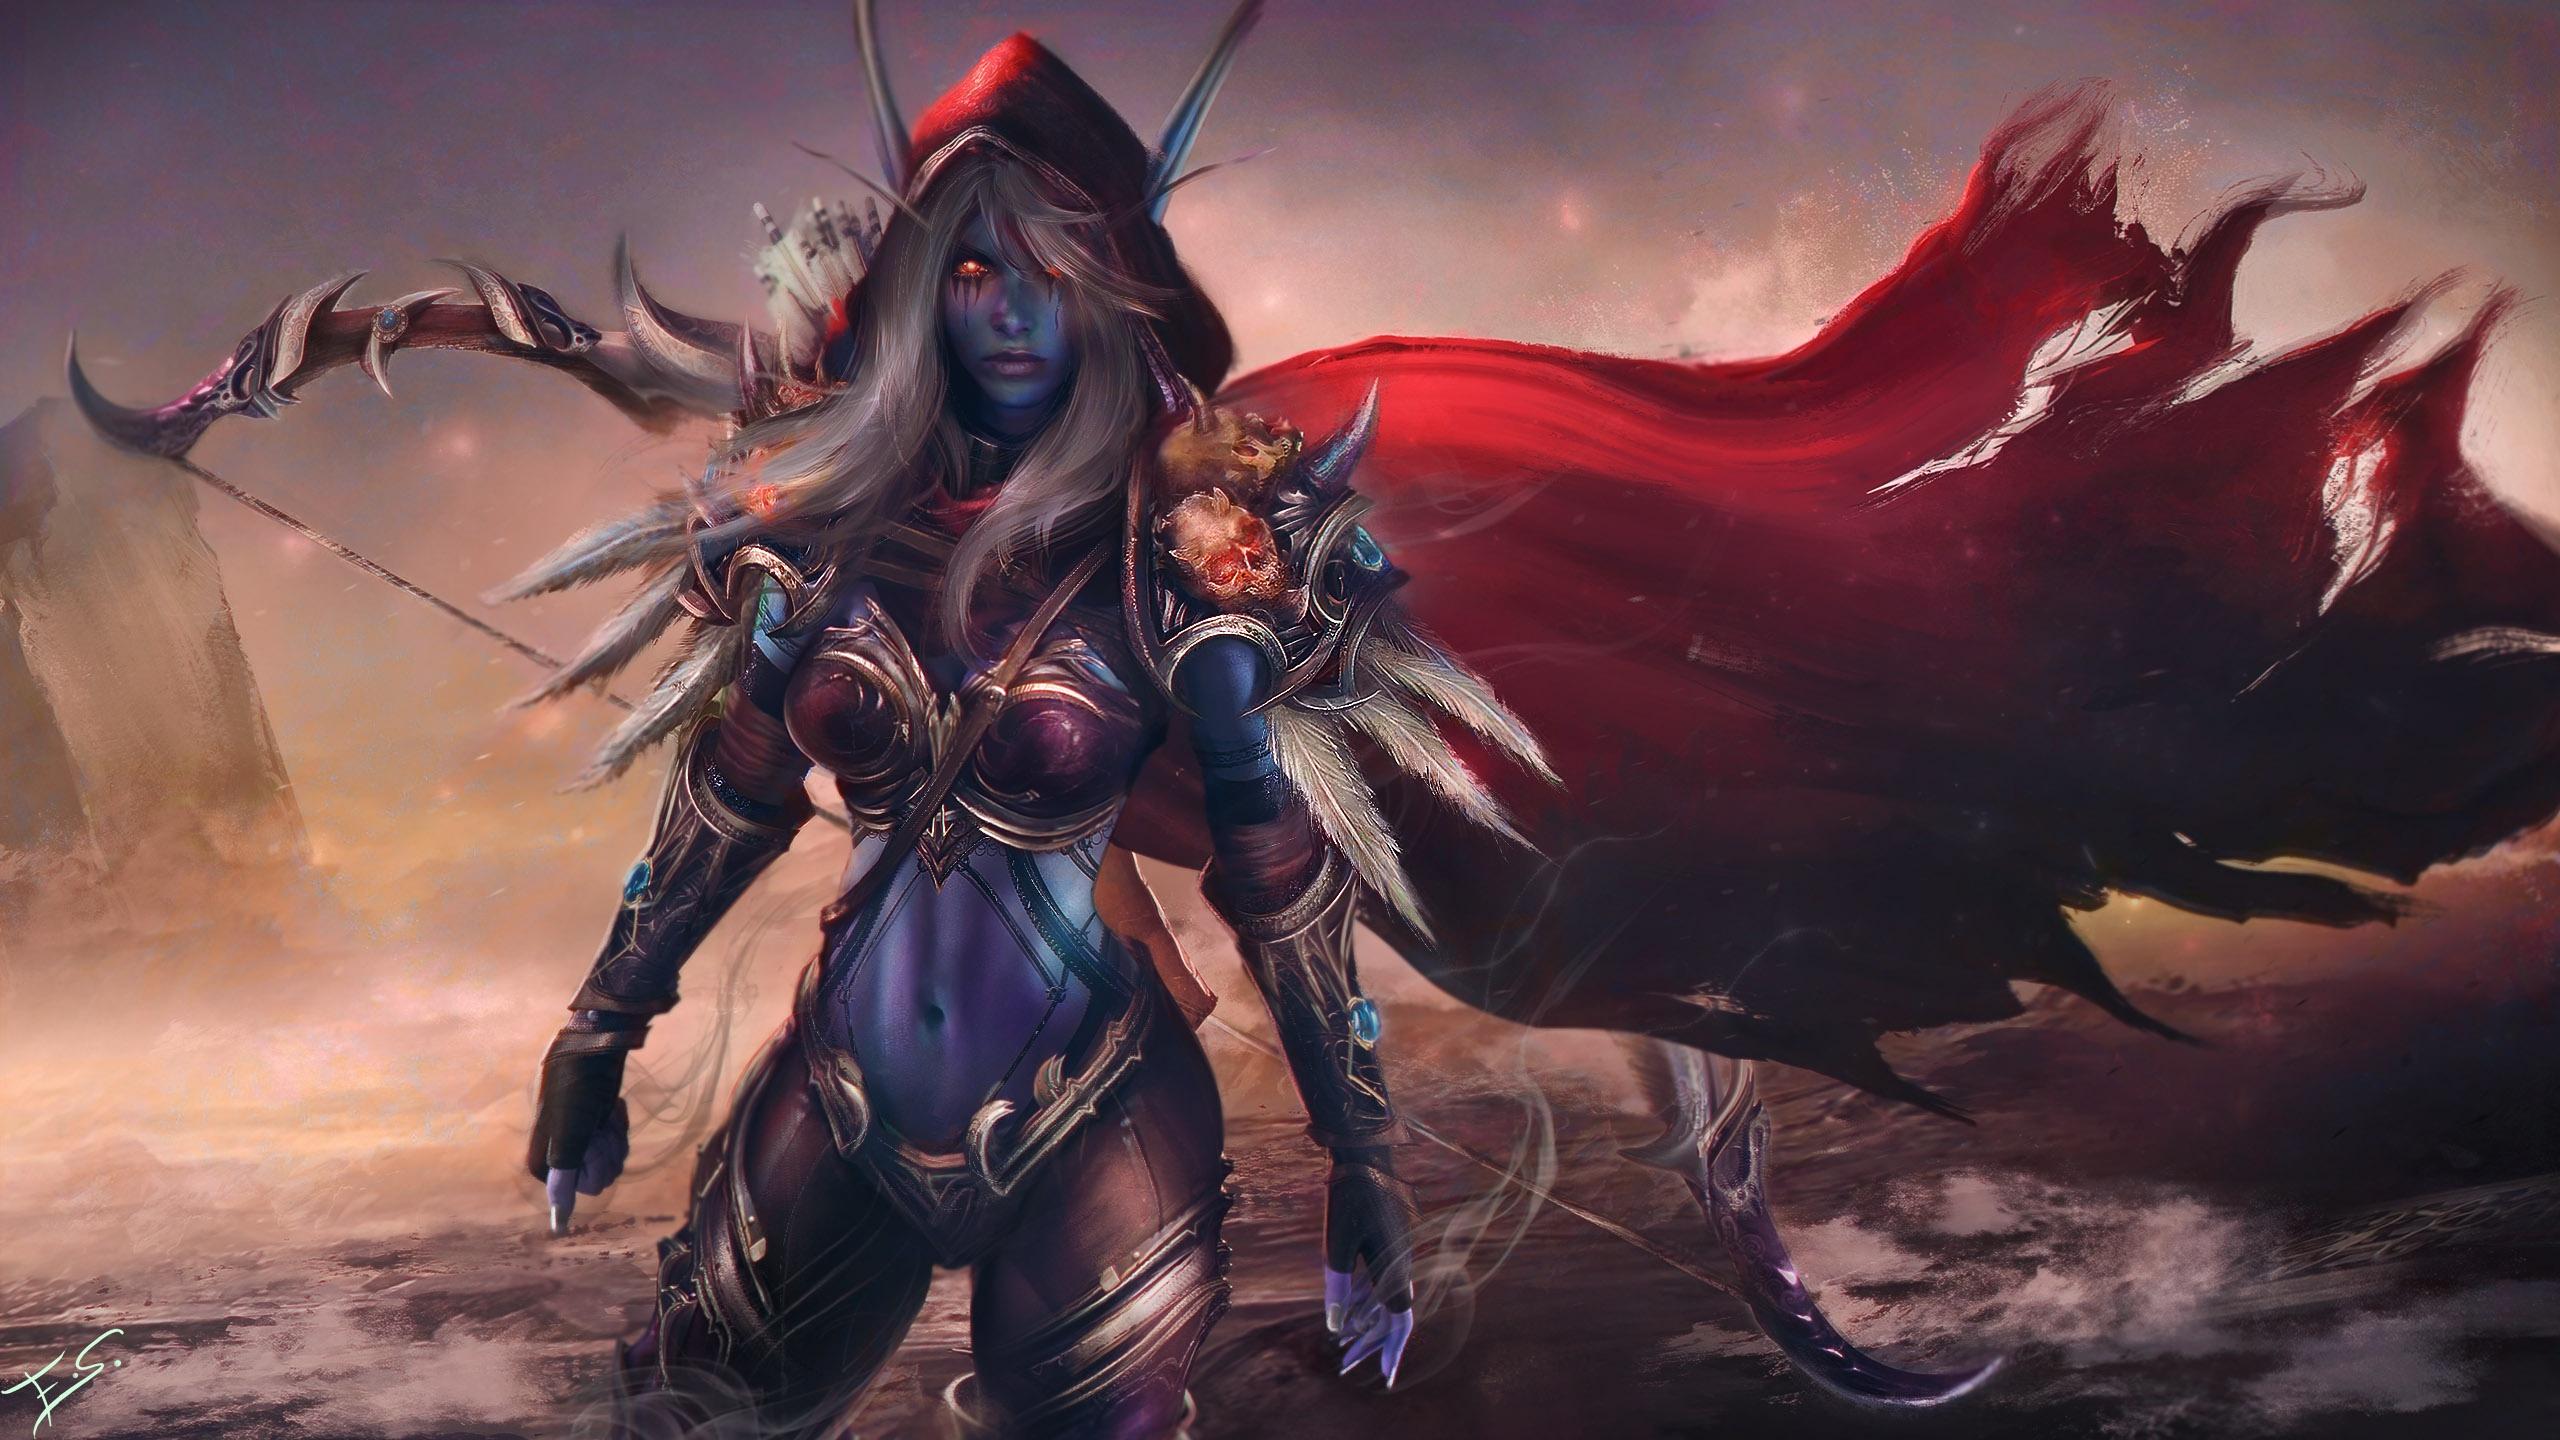 World Of Warcraft Hd Wallpaper Background Image 2560x1440 Id